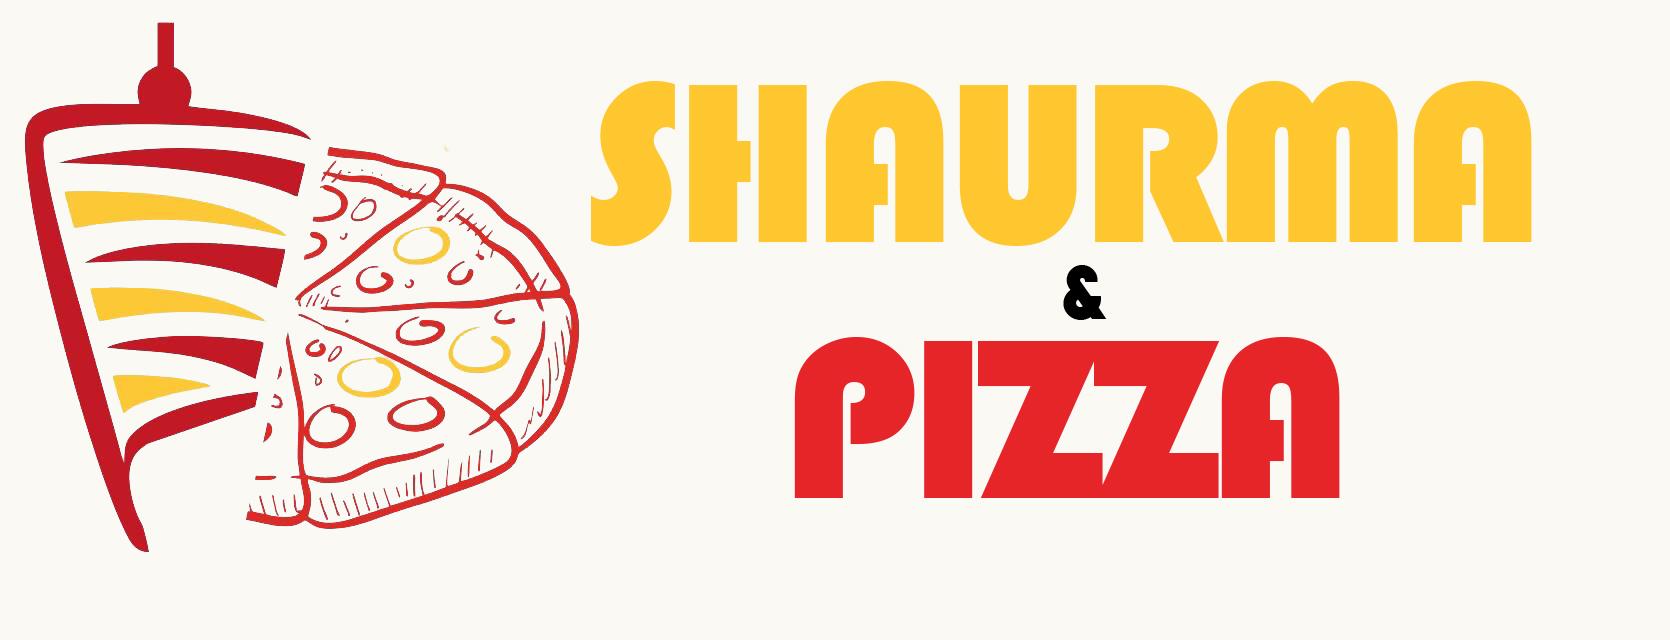 Shaurma & Pizza